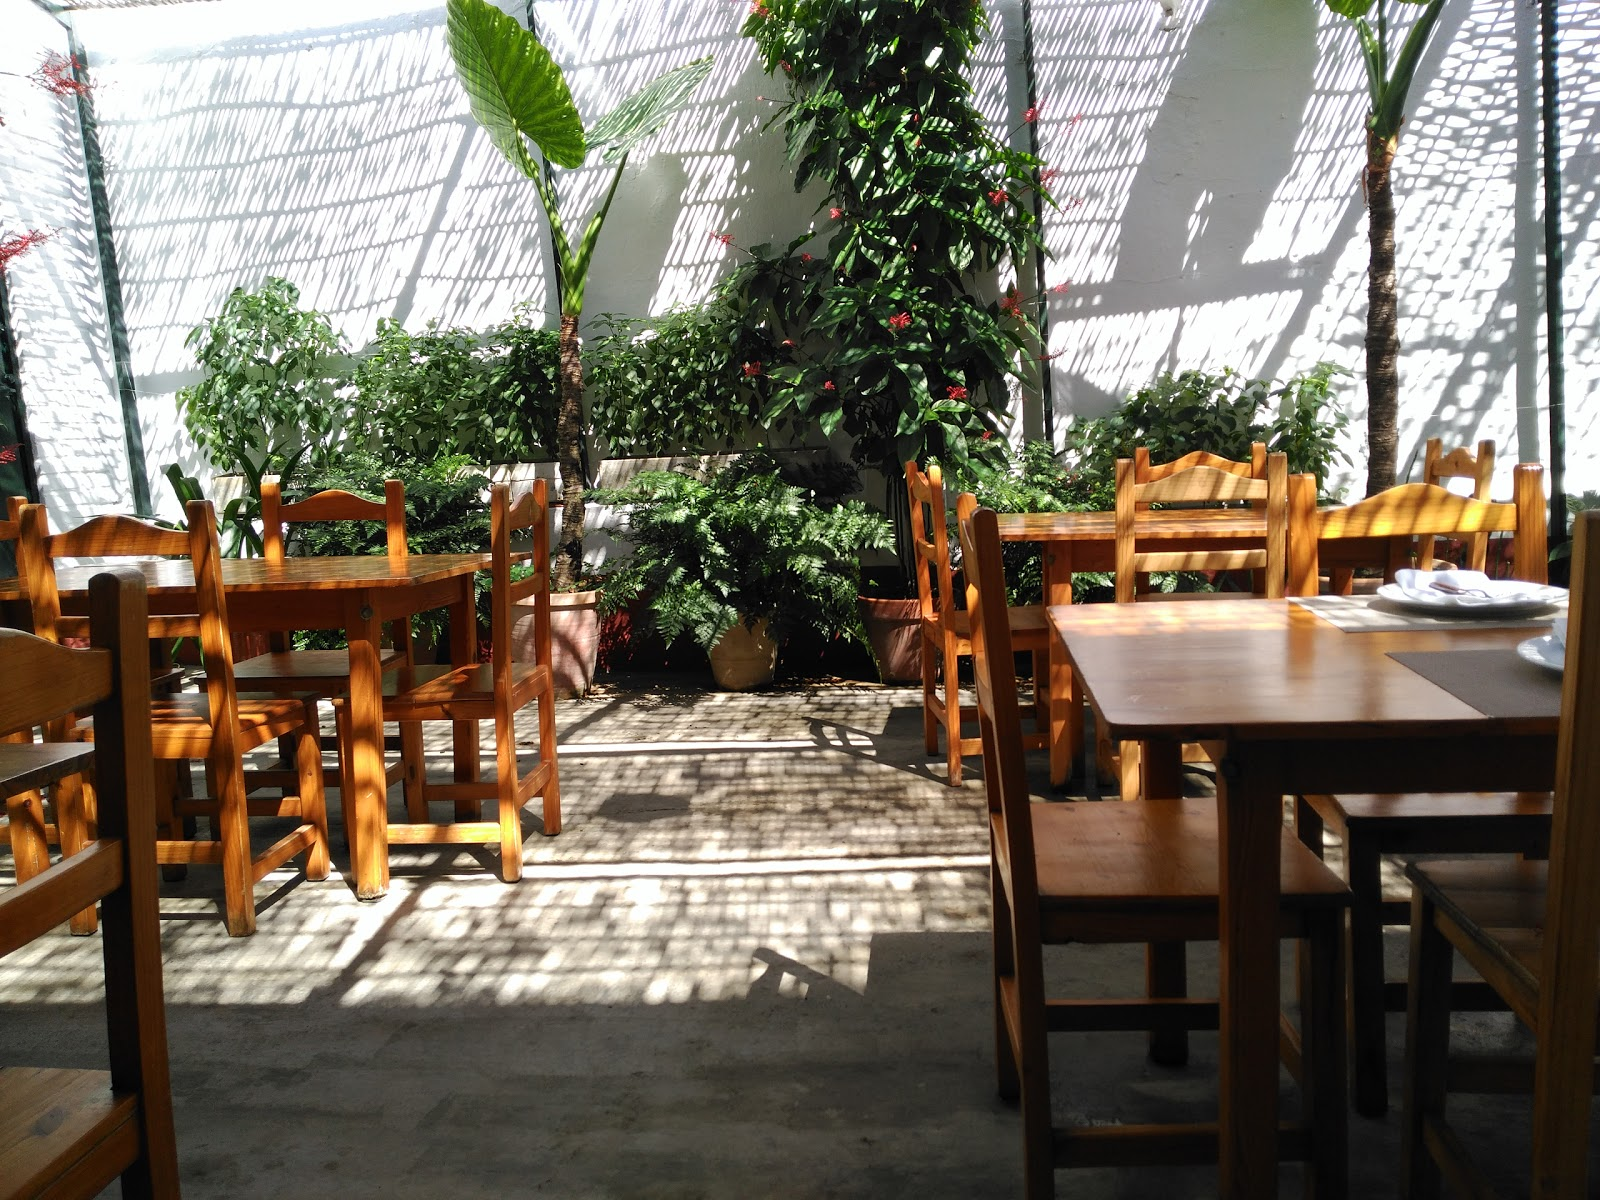 Bodega Café Galeon